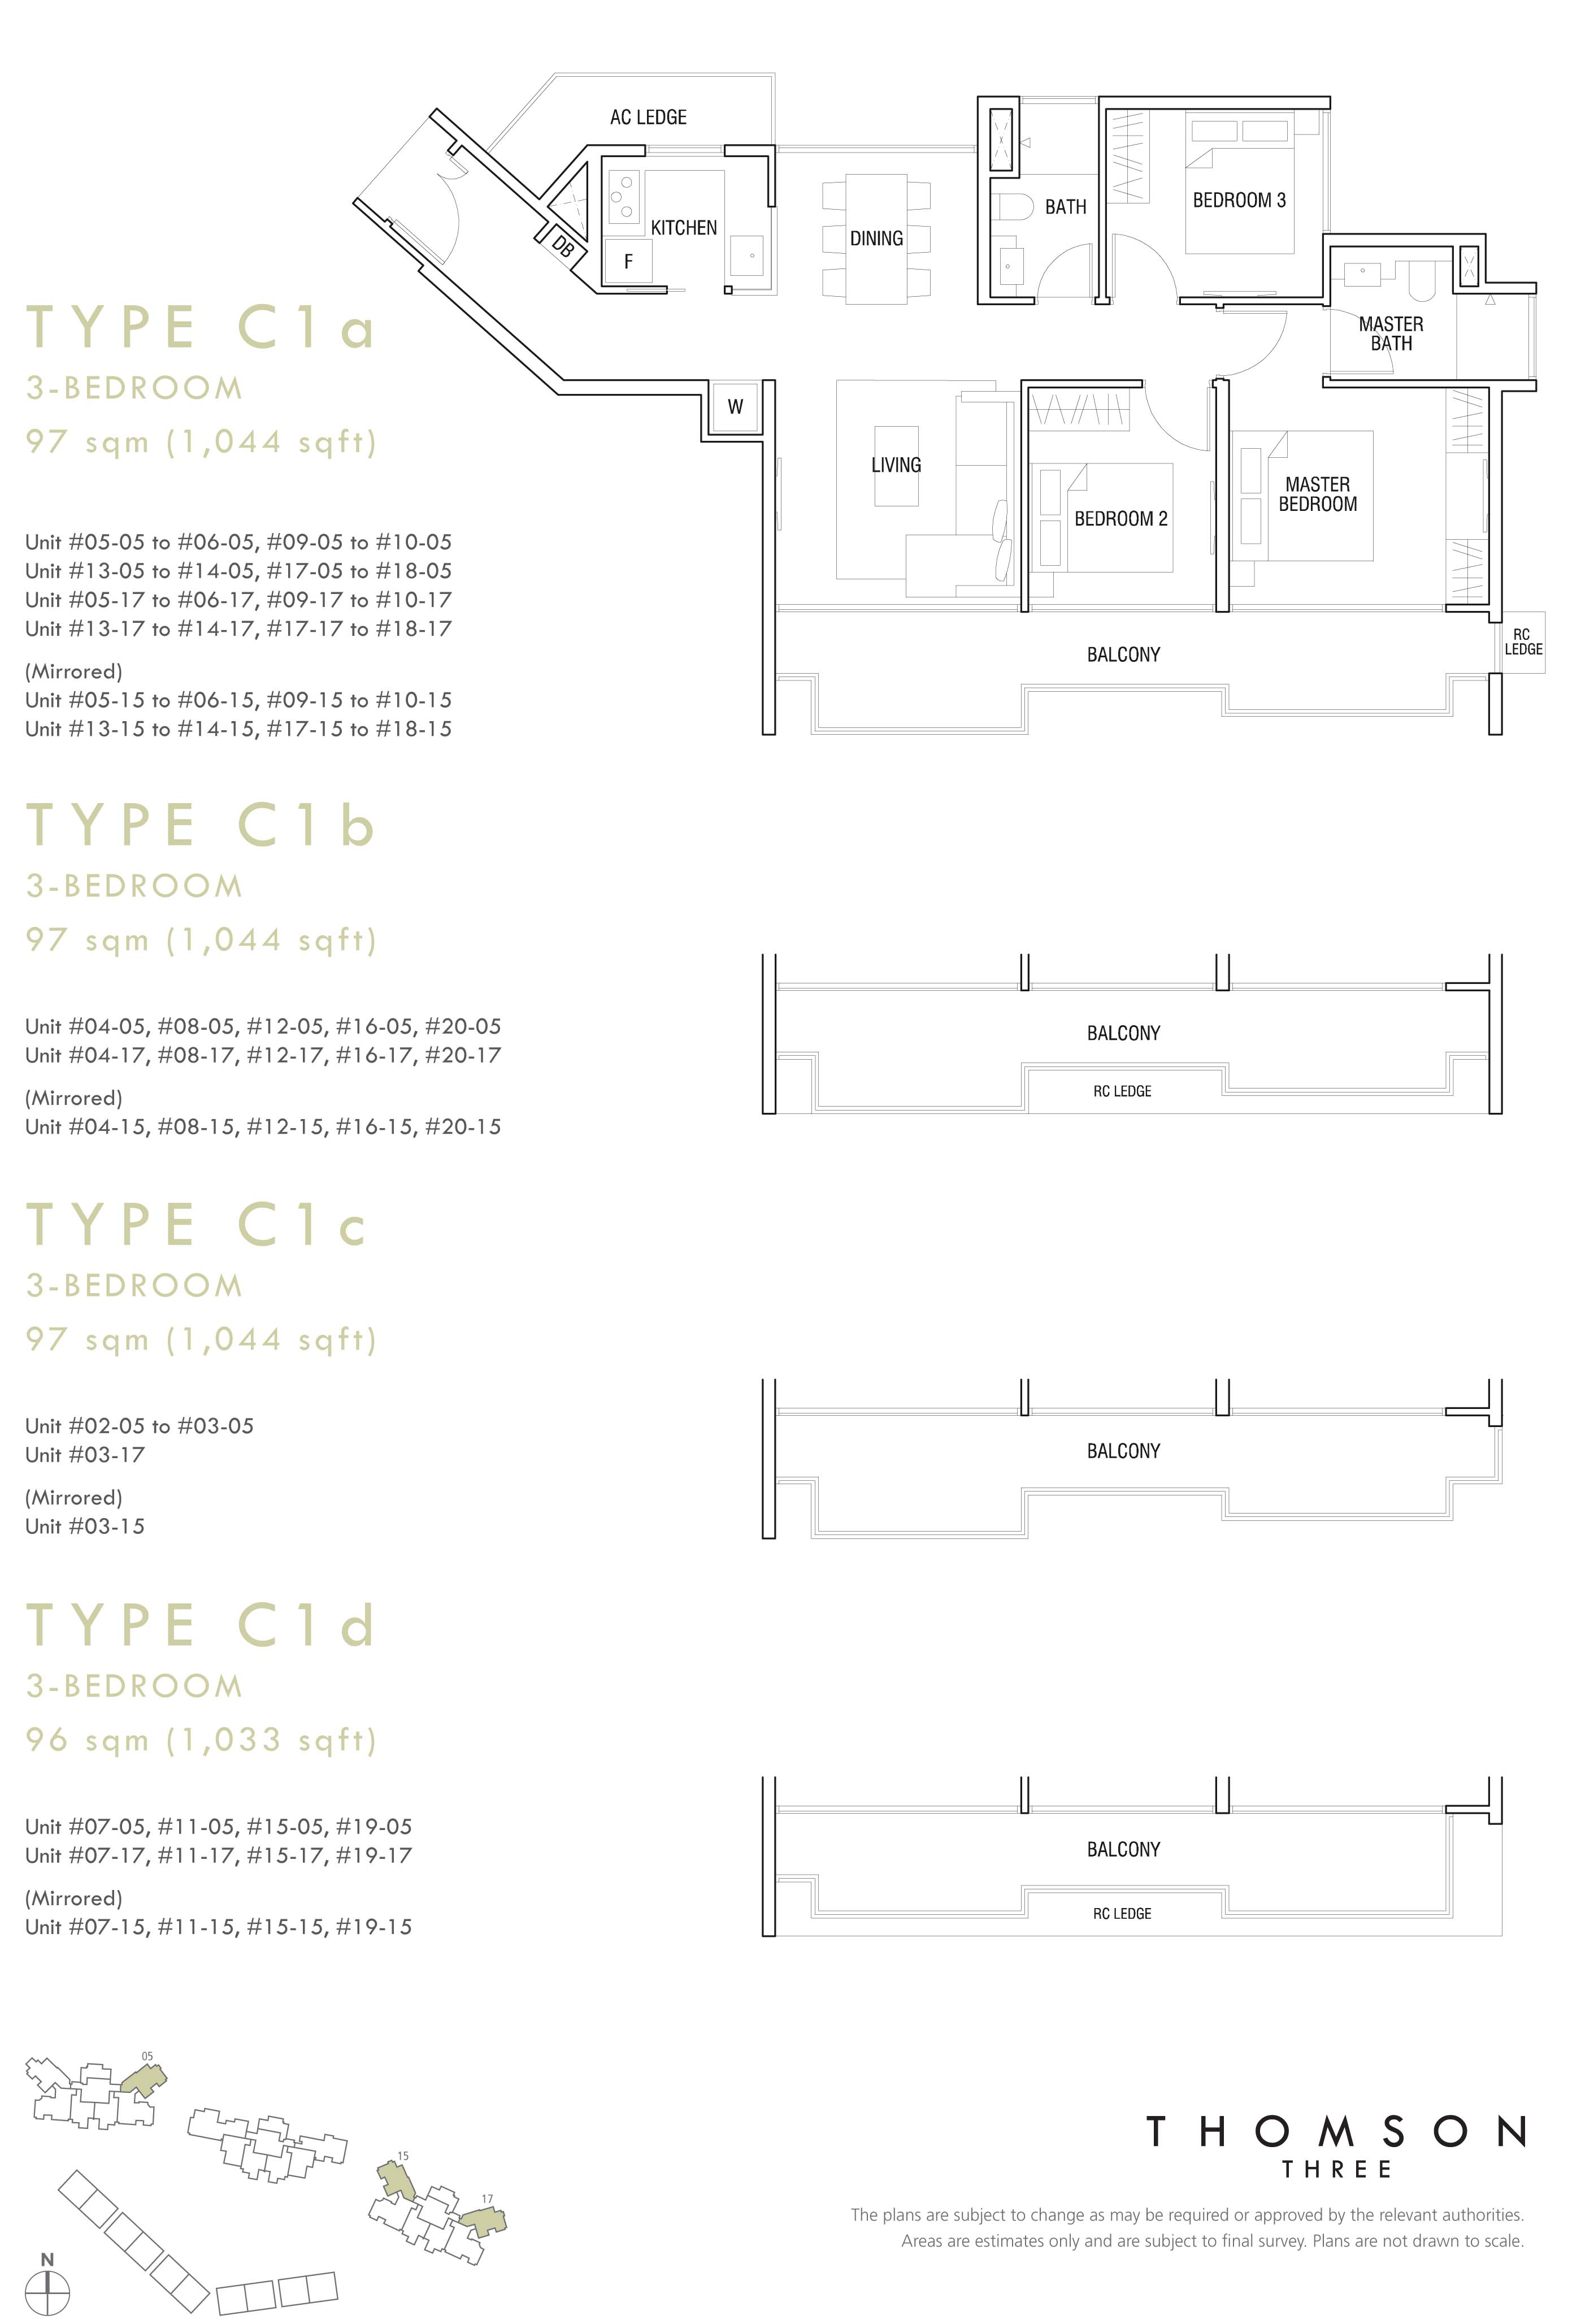 3 Br (Type C1a, Type C1b, Type C1c, Type C1d)